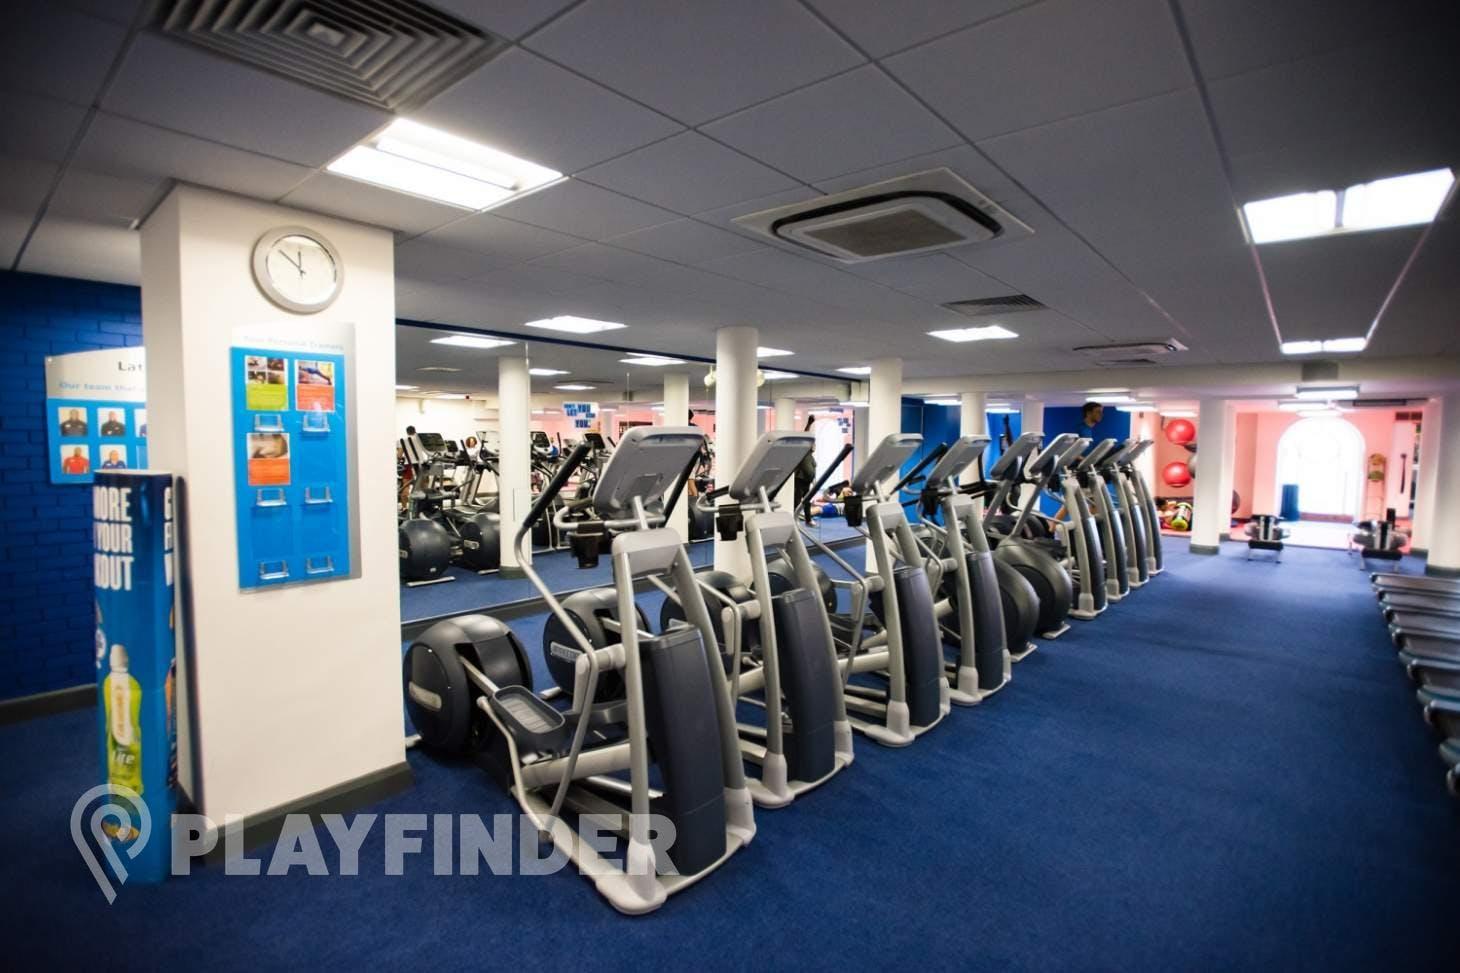 Latchmere Leisure Centre Gym gym